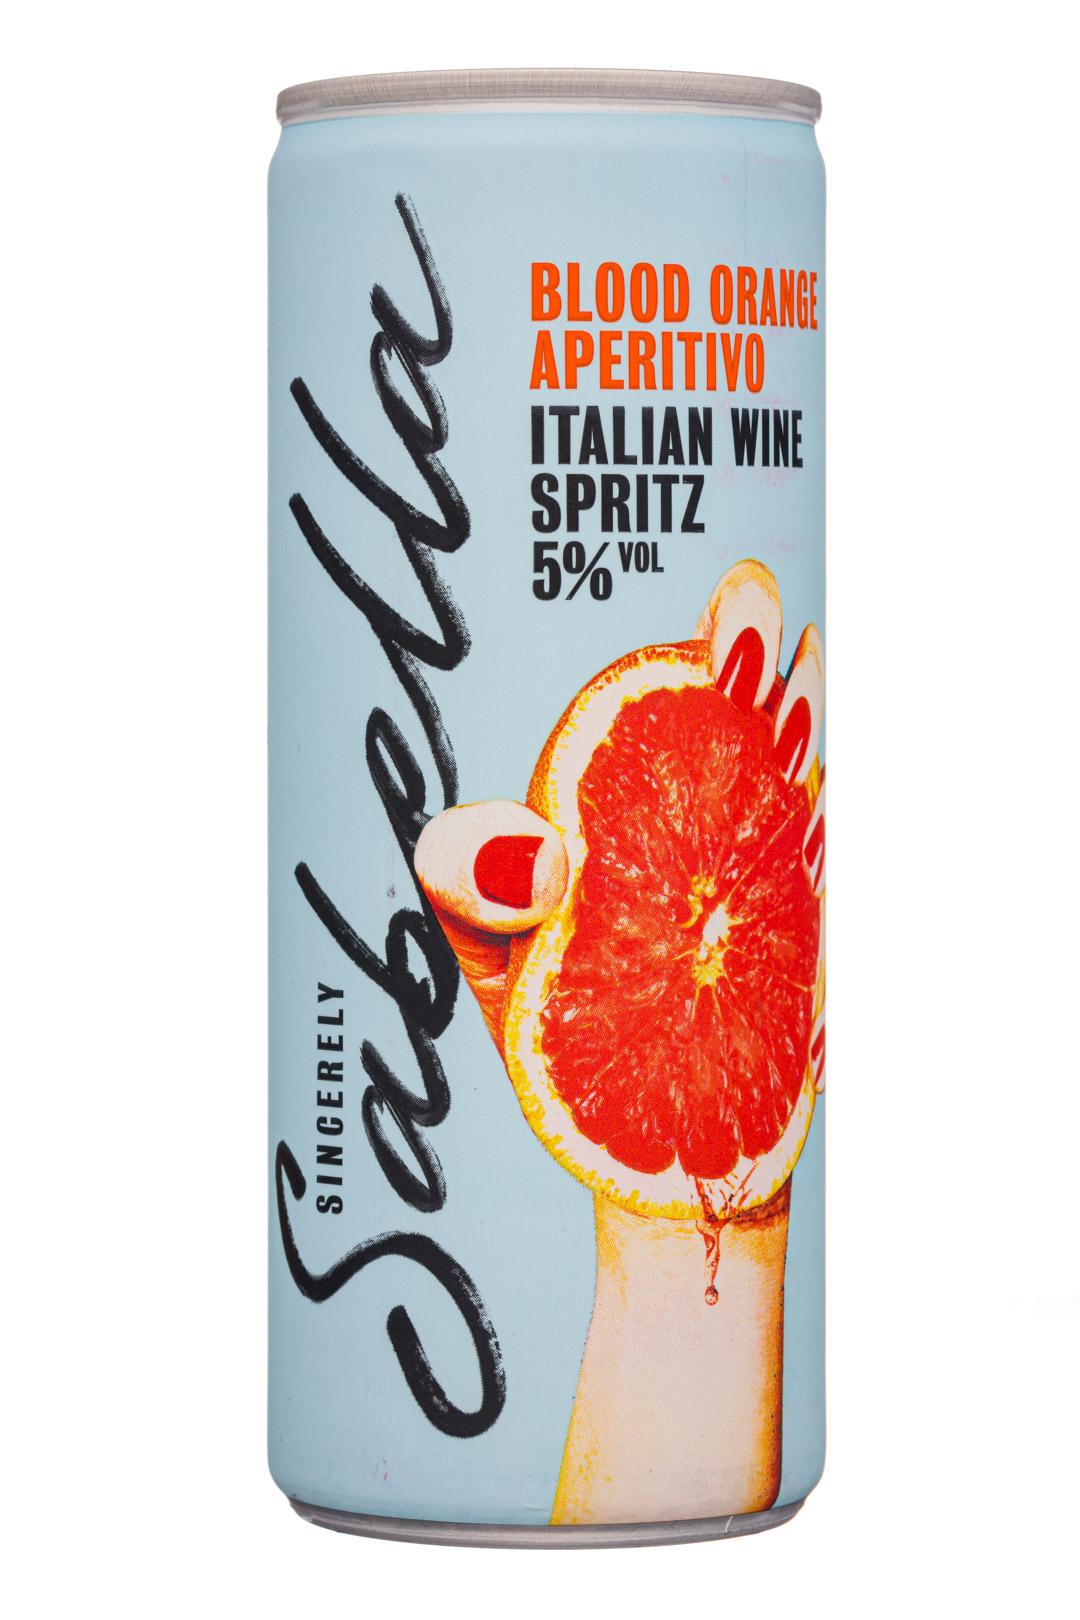 Blood Orange Aperitivo - Italian Wine Spritz